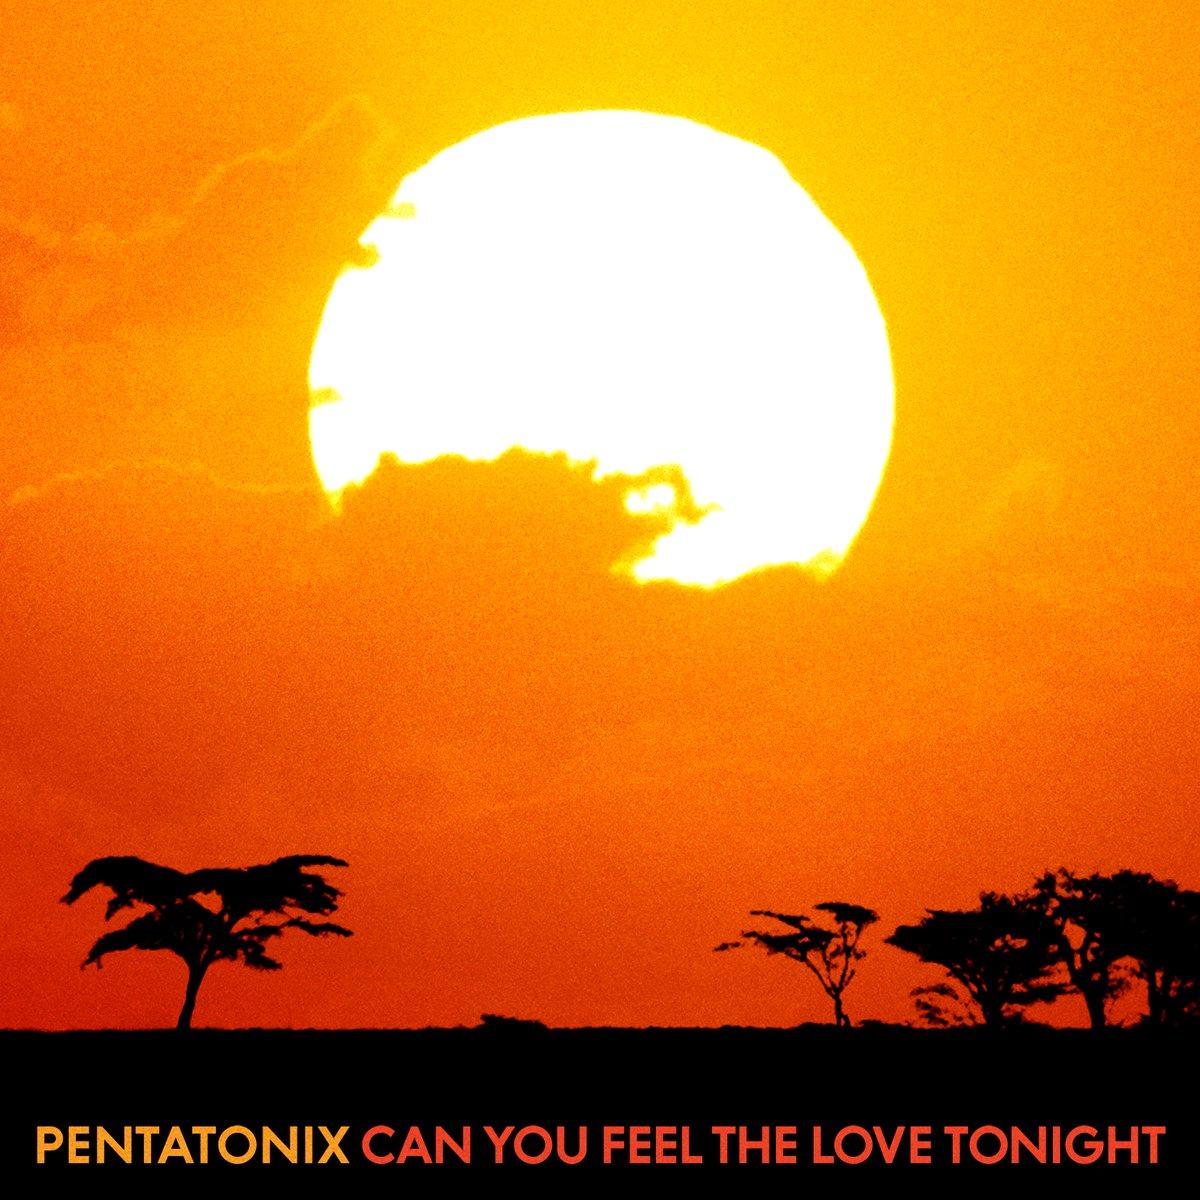 Pentatonix on Twitter: